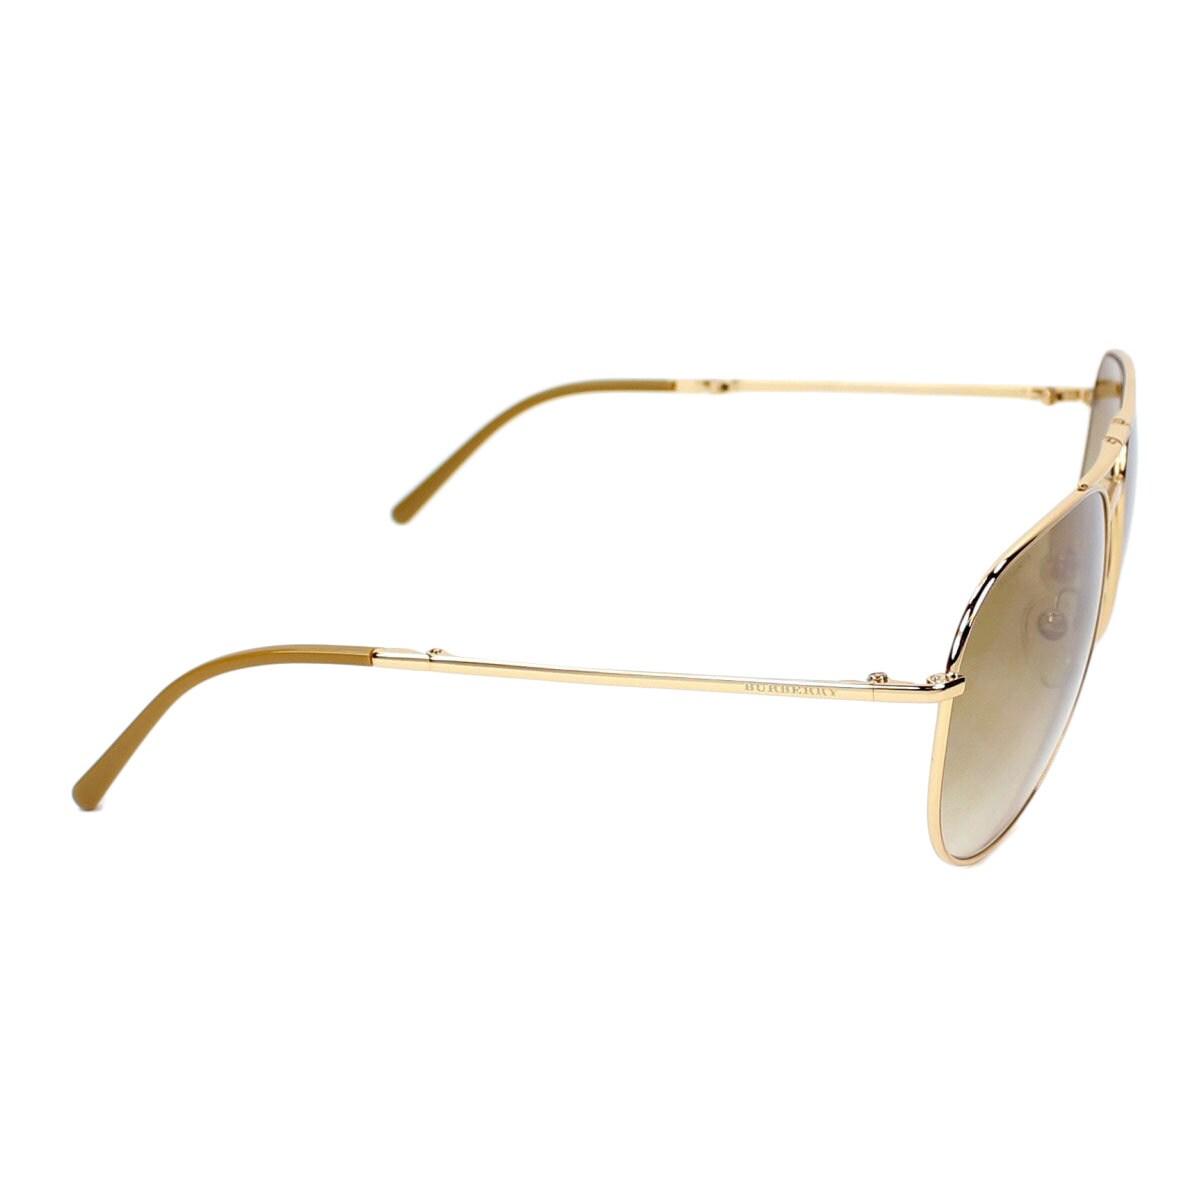 979225673d9c ... Burberry Men s BE3071 Metal Aviator Sunglasses Gold Large Shop Burberry  Men s BE3071 Metal Aviator Sunglasses Gold Large Free Shipping Today  Overstock ...